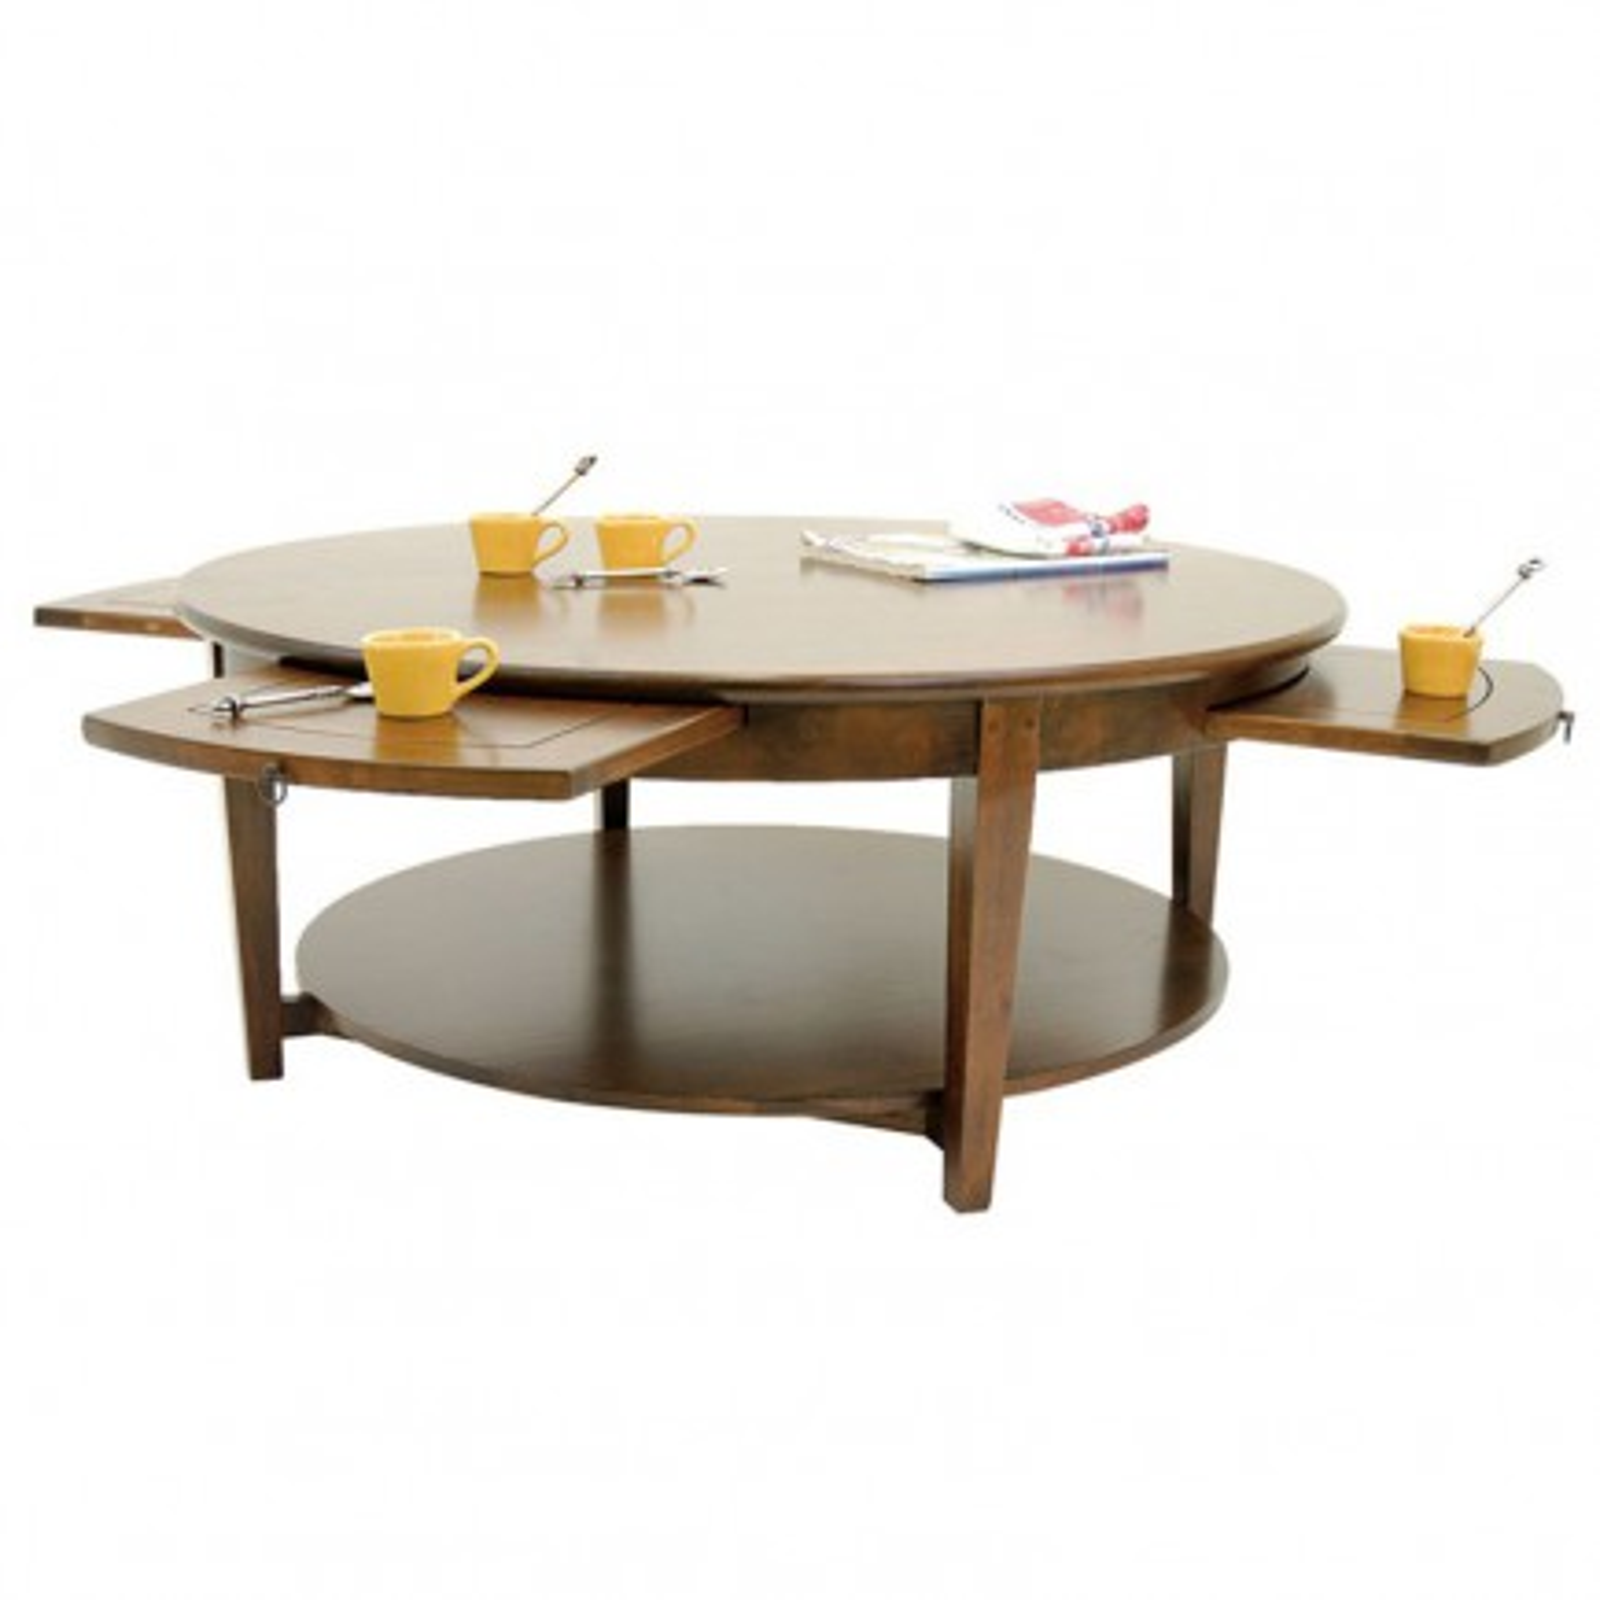 Tiroir guide d 39 achat - Table basse ronde avec tiroir ...